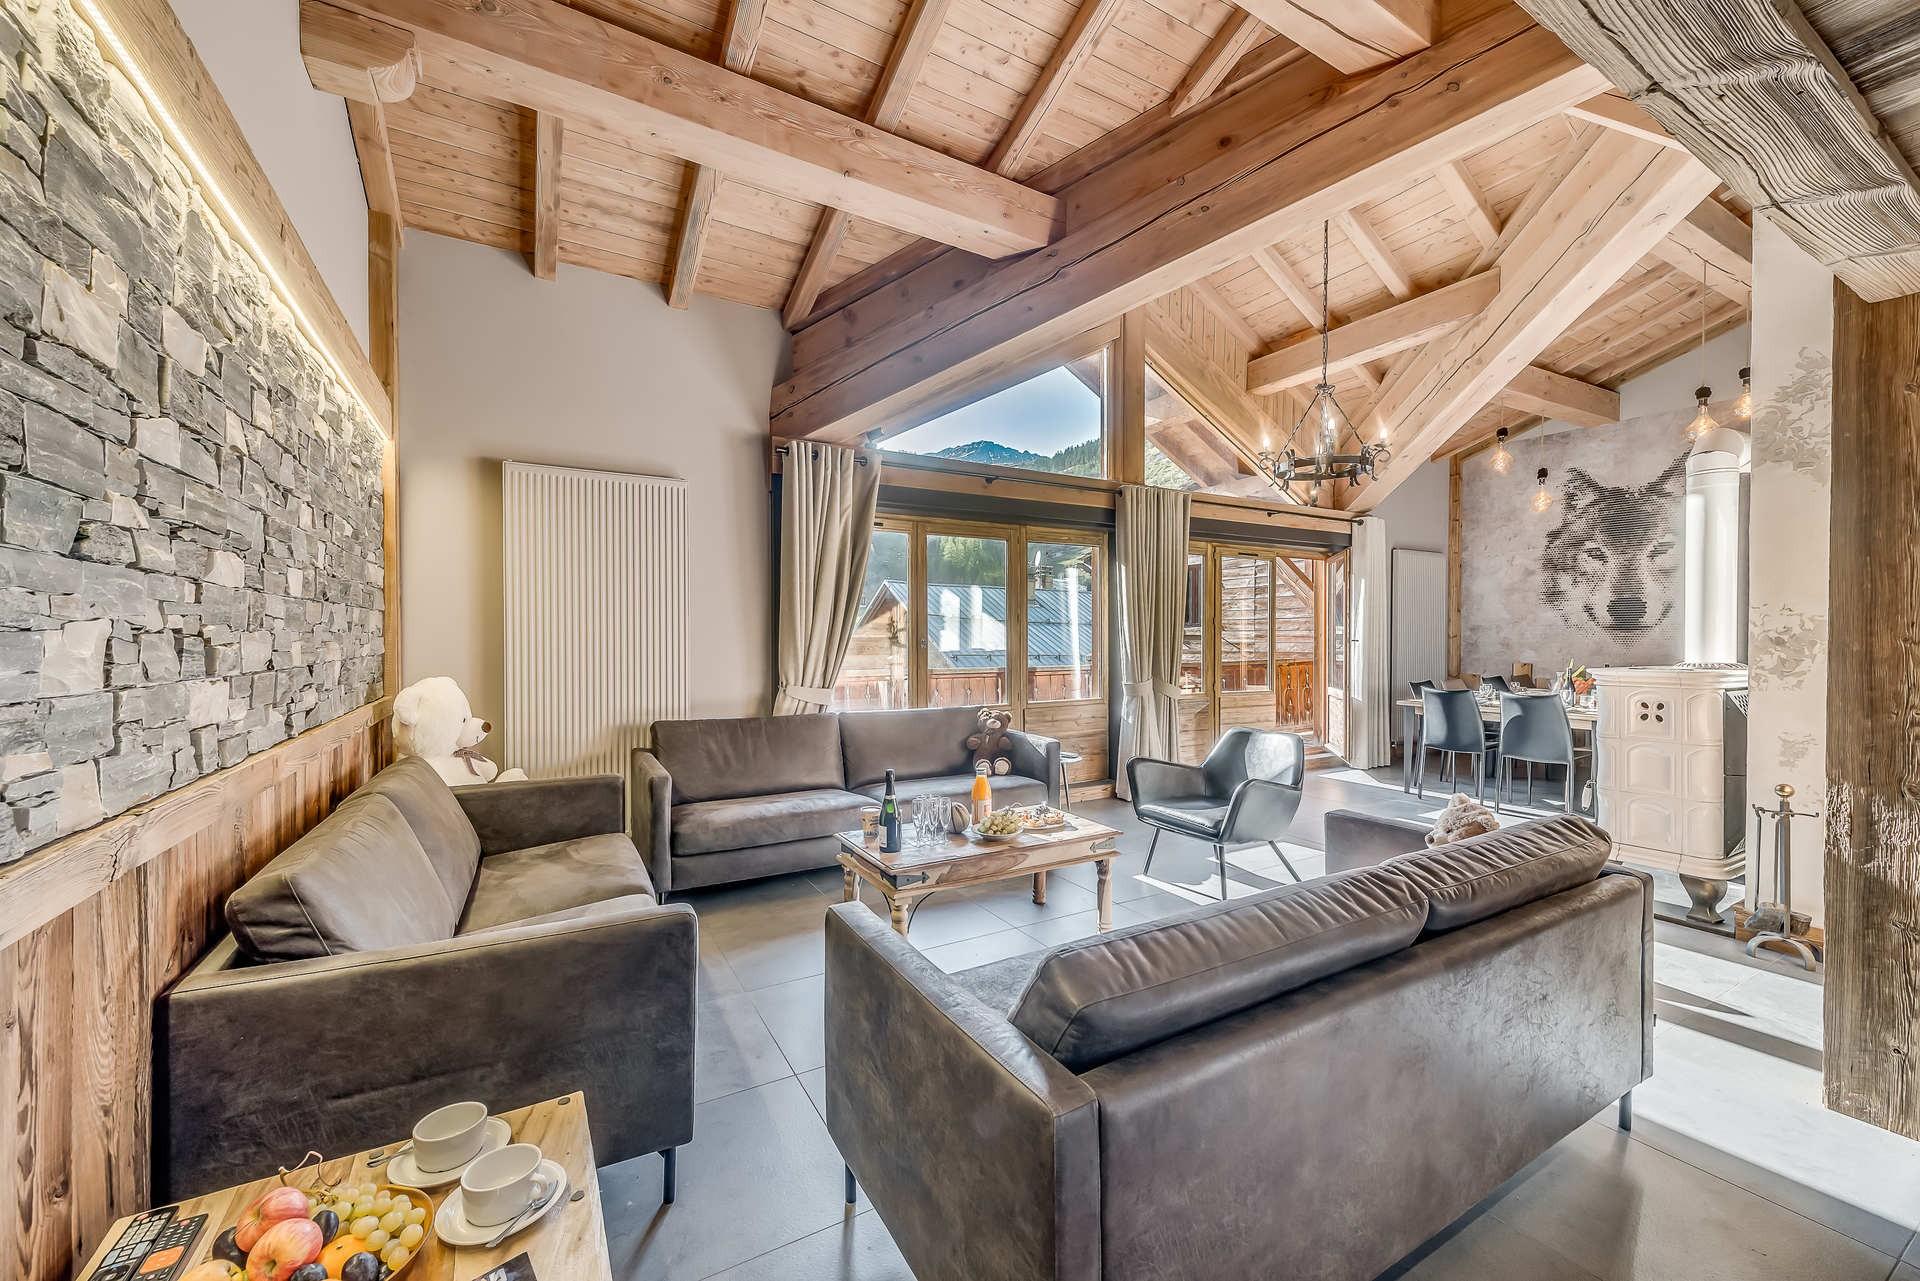 val-d-isere-location-chalet-luxe-cranzate